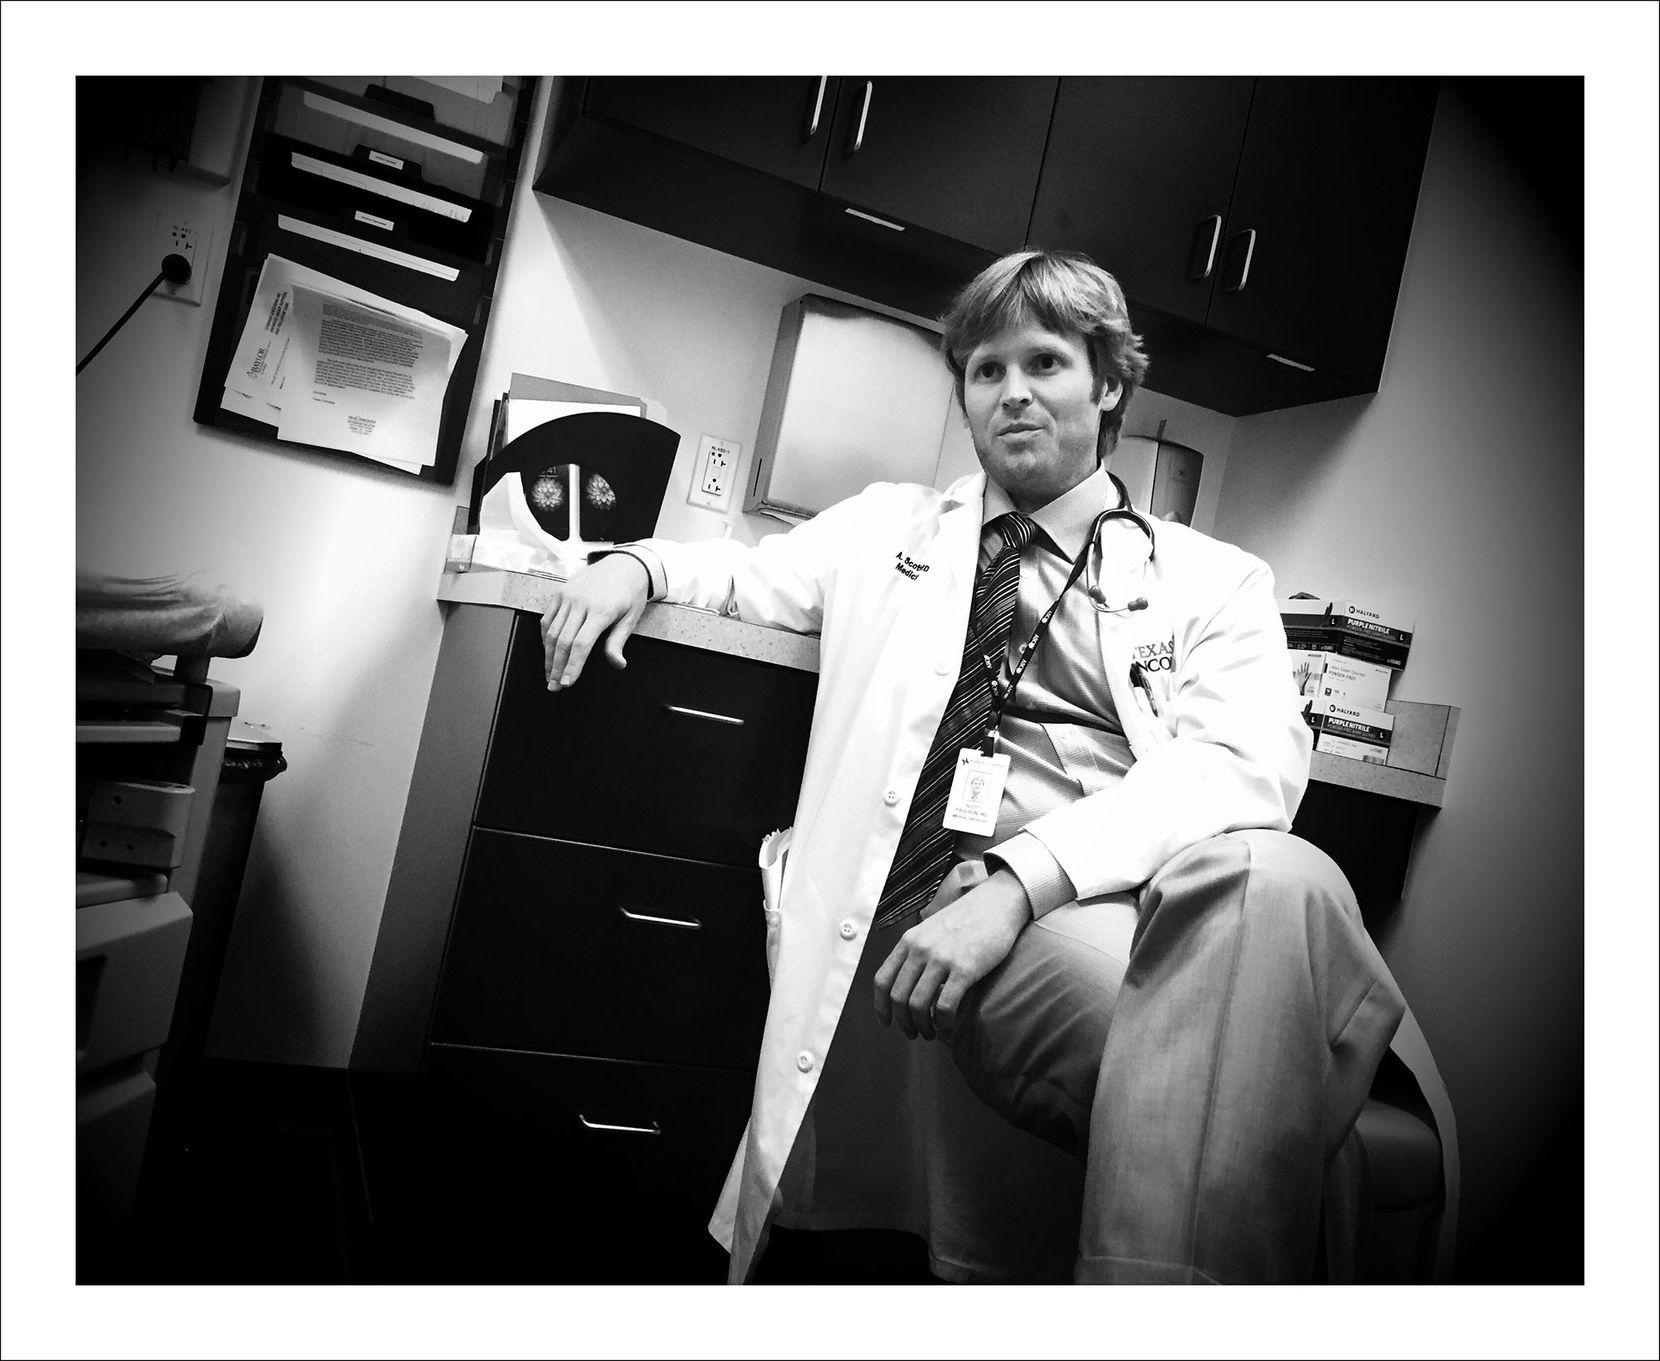 9/22/16 — Dr. Scott Paulson. My oncologist.